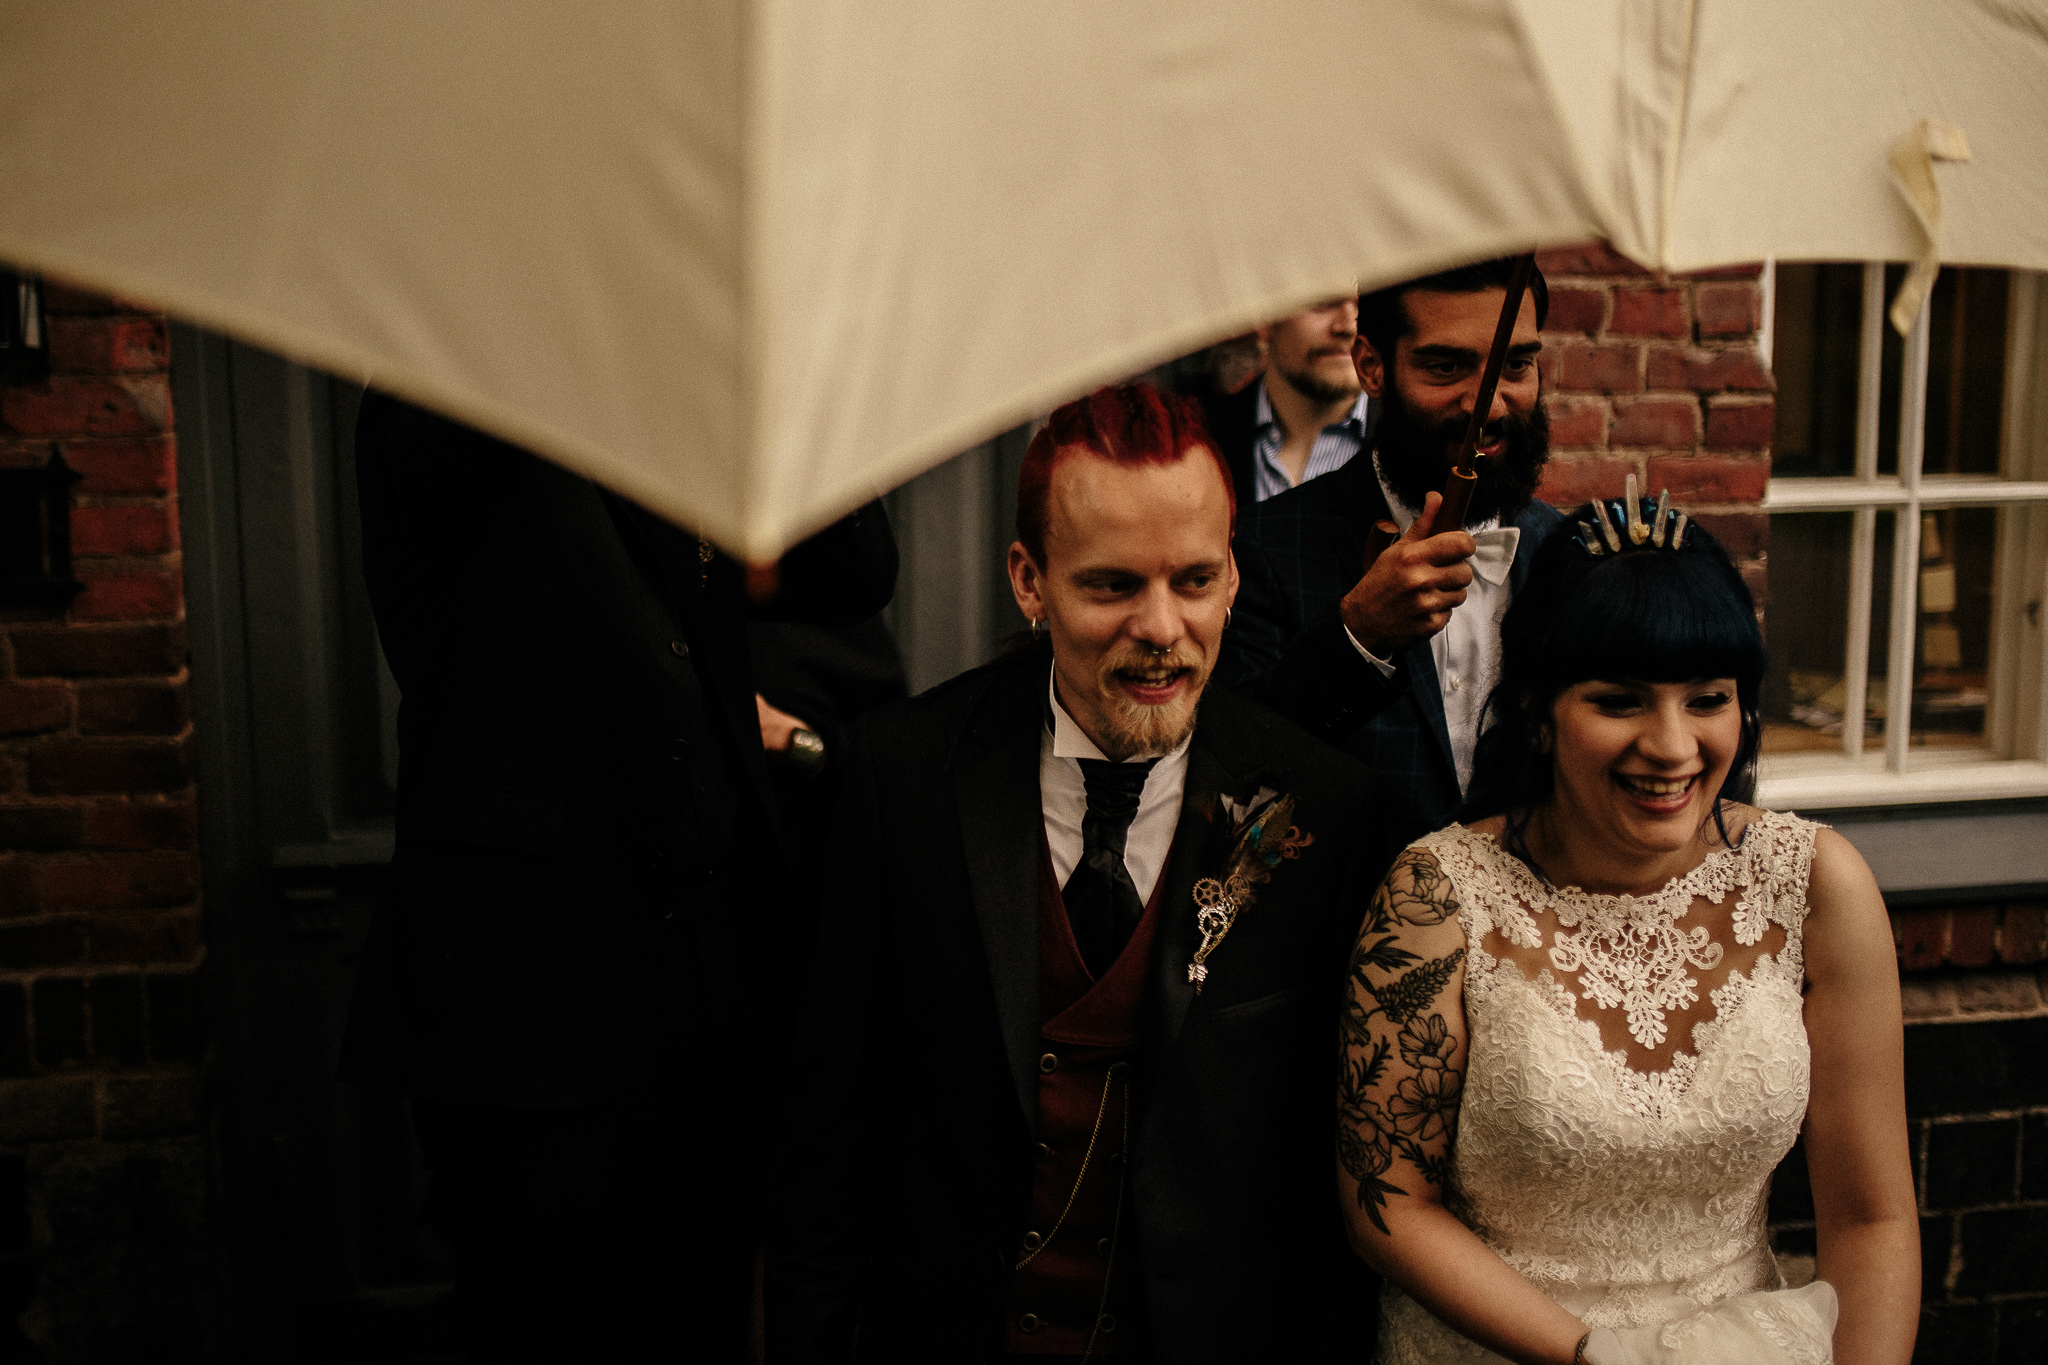 Ceren & Jani - Finland Wedding Photographer - Weddings by Qay - Wedding Photographer (32 of 166).jpg